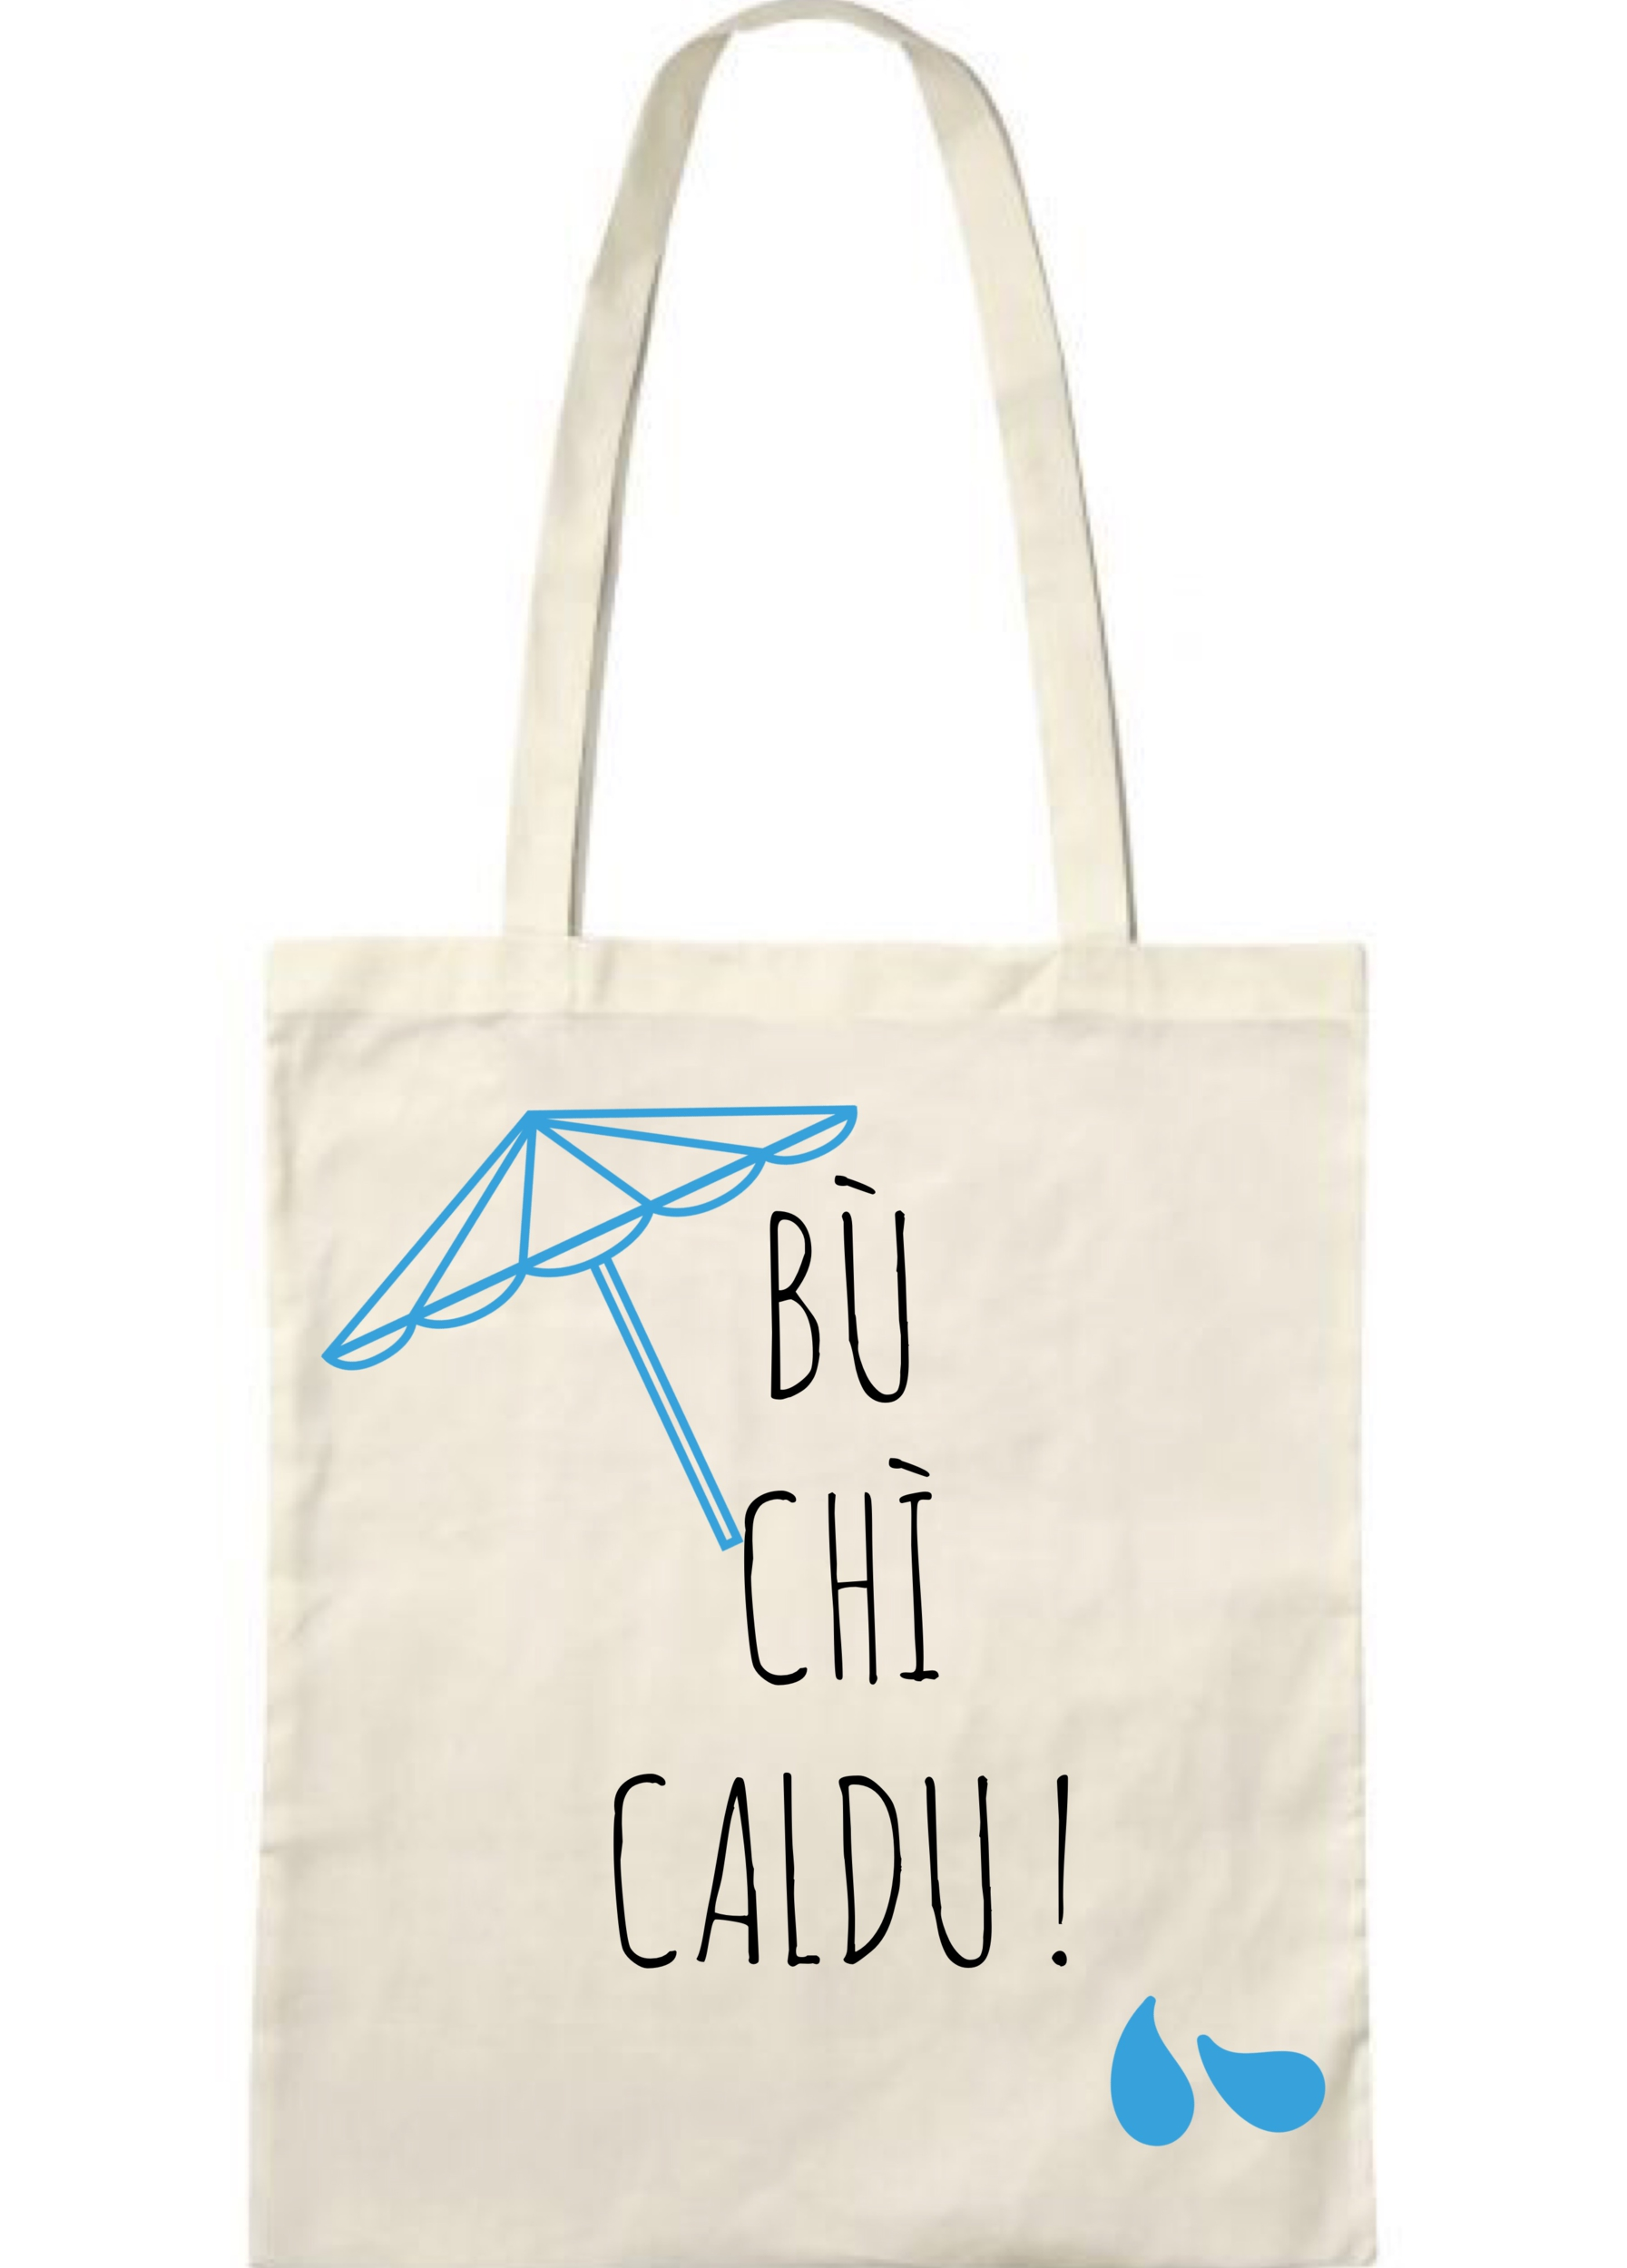 CALDU